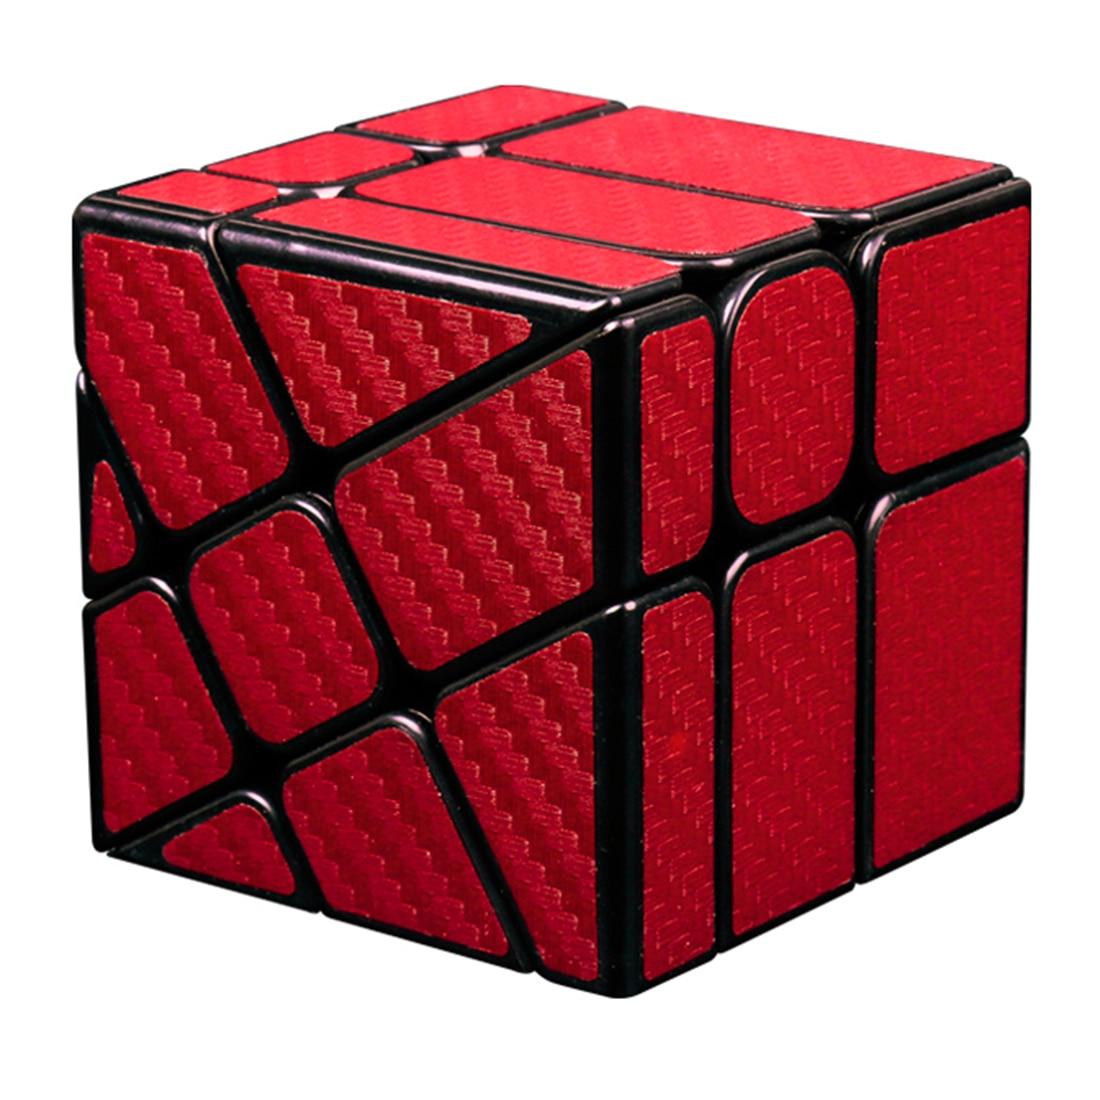 Mf8830 Cubing классе углерода Волокно Cube hotwheel смешно витой Magic Cube Puzzle игрушки для Challange-красный